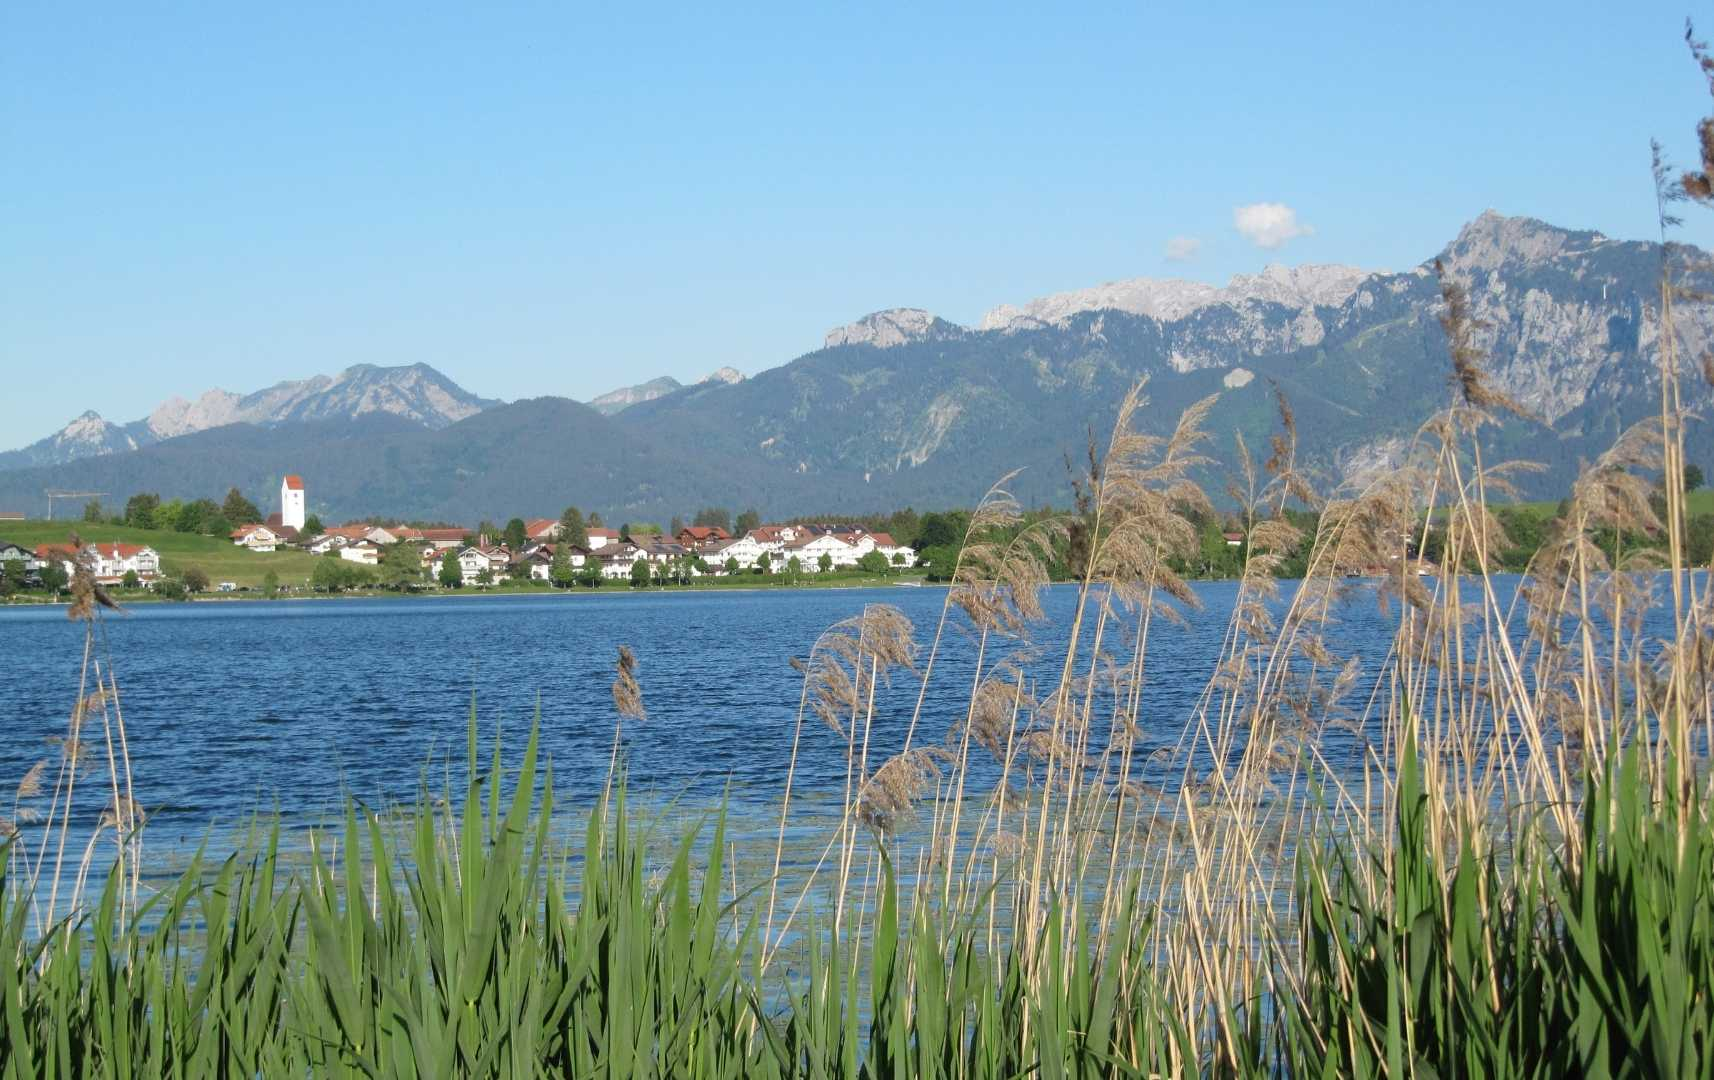 Hopfensee - Urlaub in Bayern